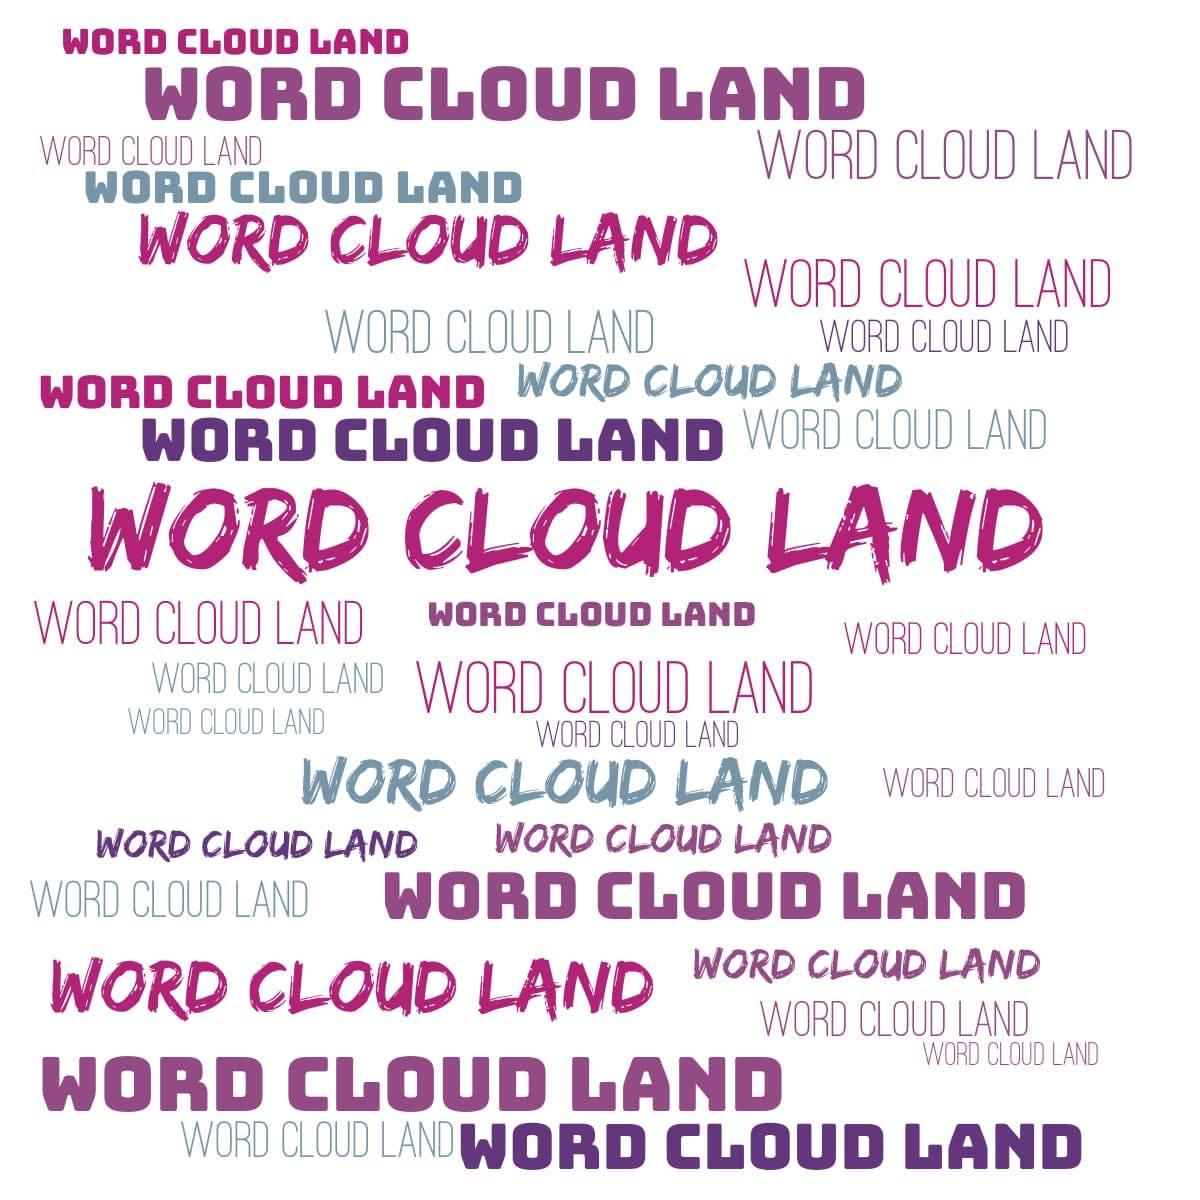 Word-cloud-land